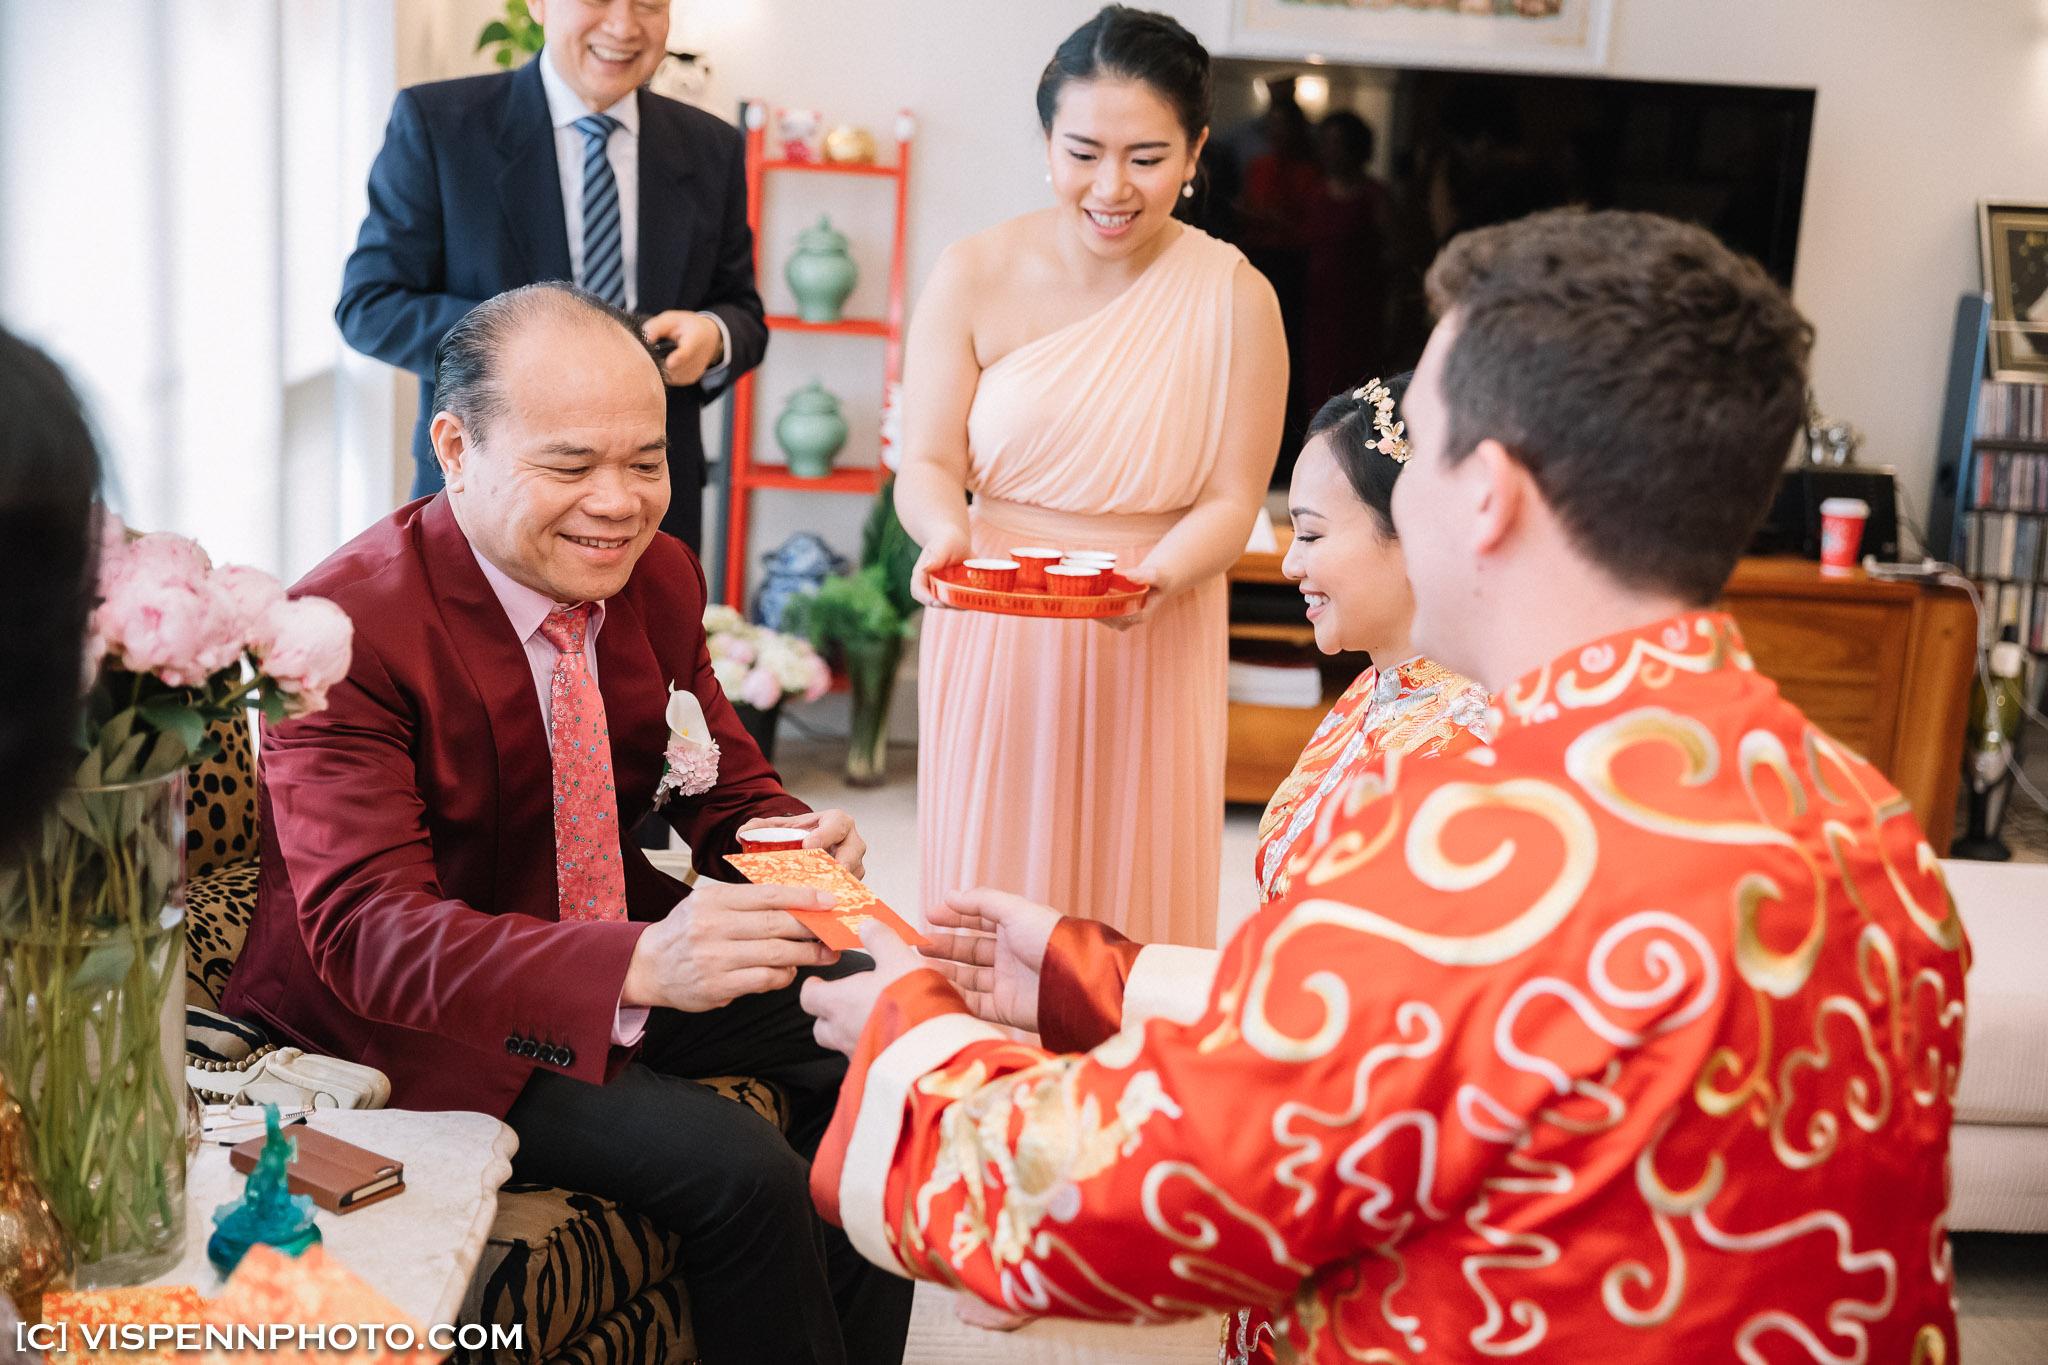 WEDDING DAY Photography Melbourne ZHPENN Kat P1 01442